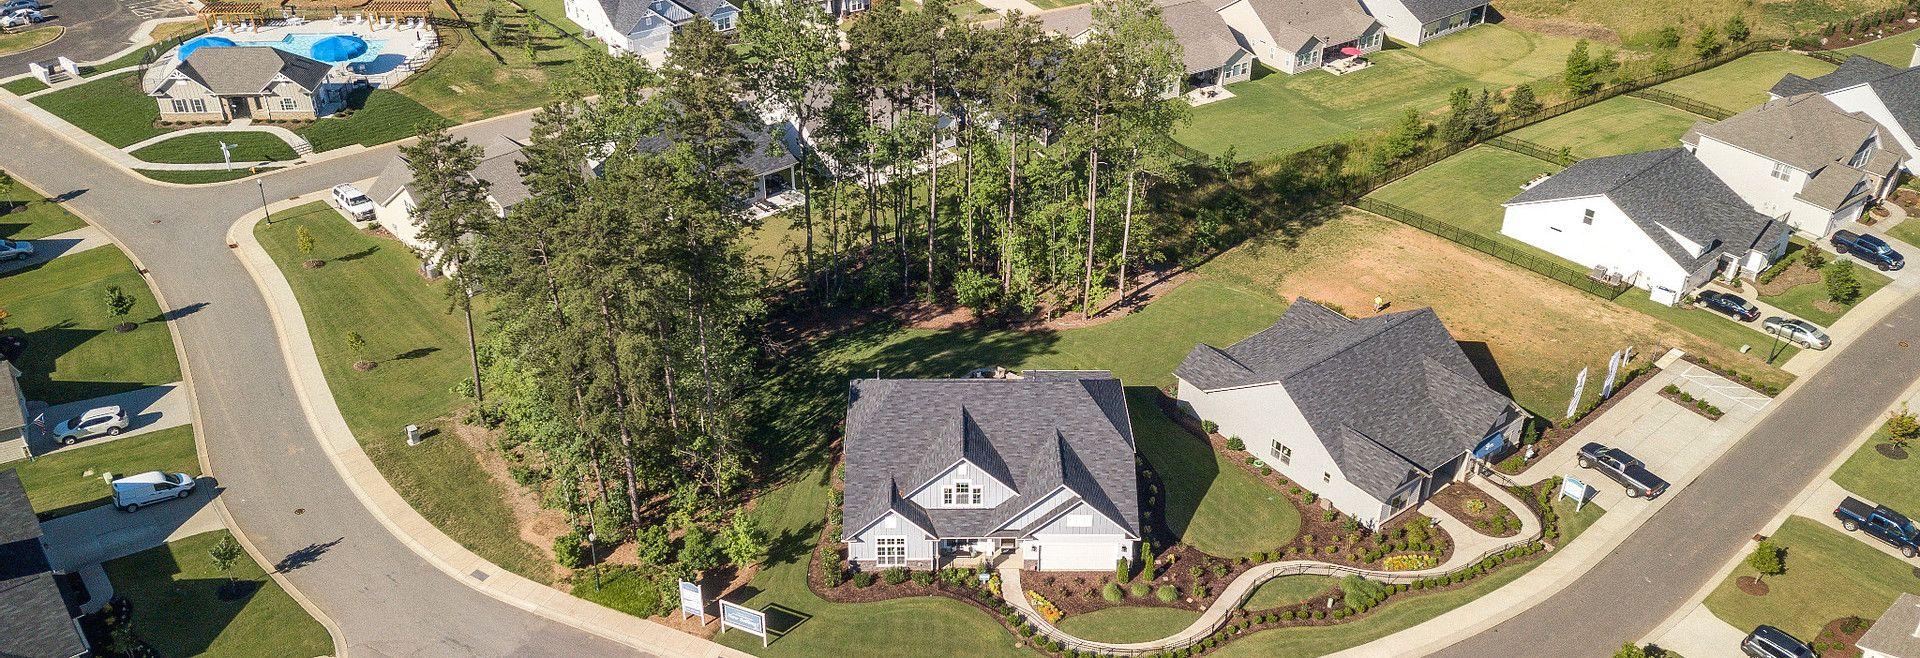 'Killians Pointe  Traditions' by Shea Homes - Family - North Carolina in Charlotte